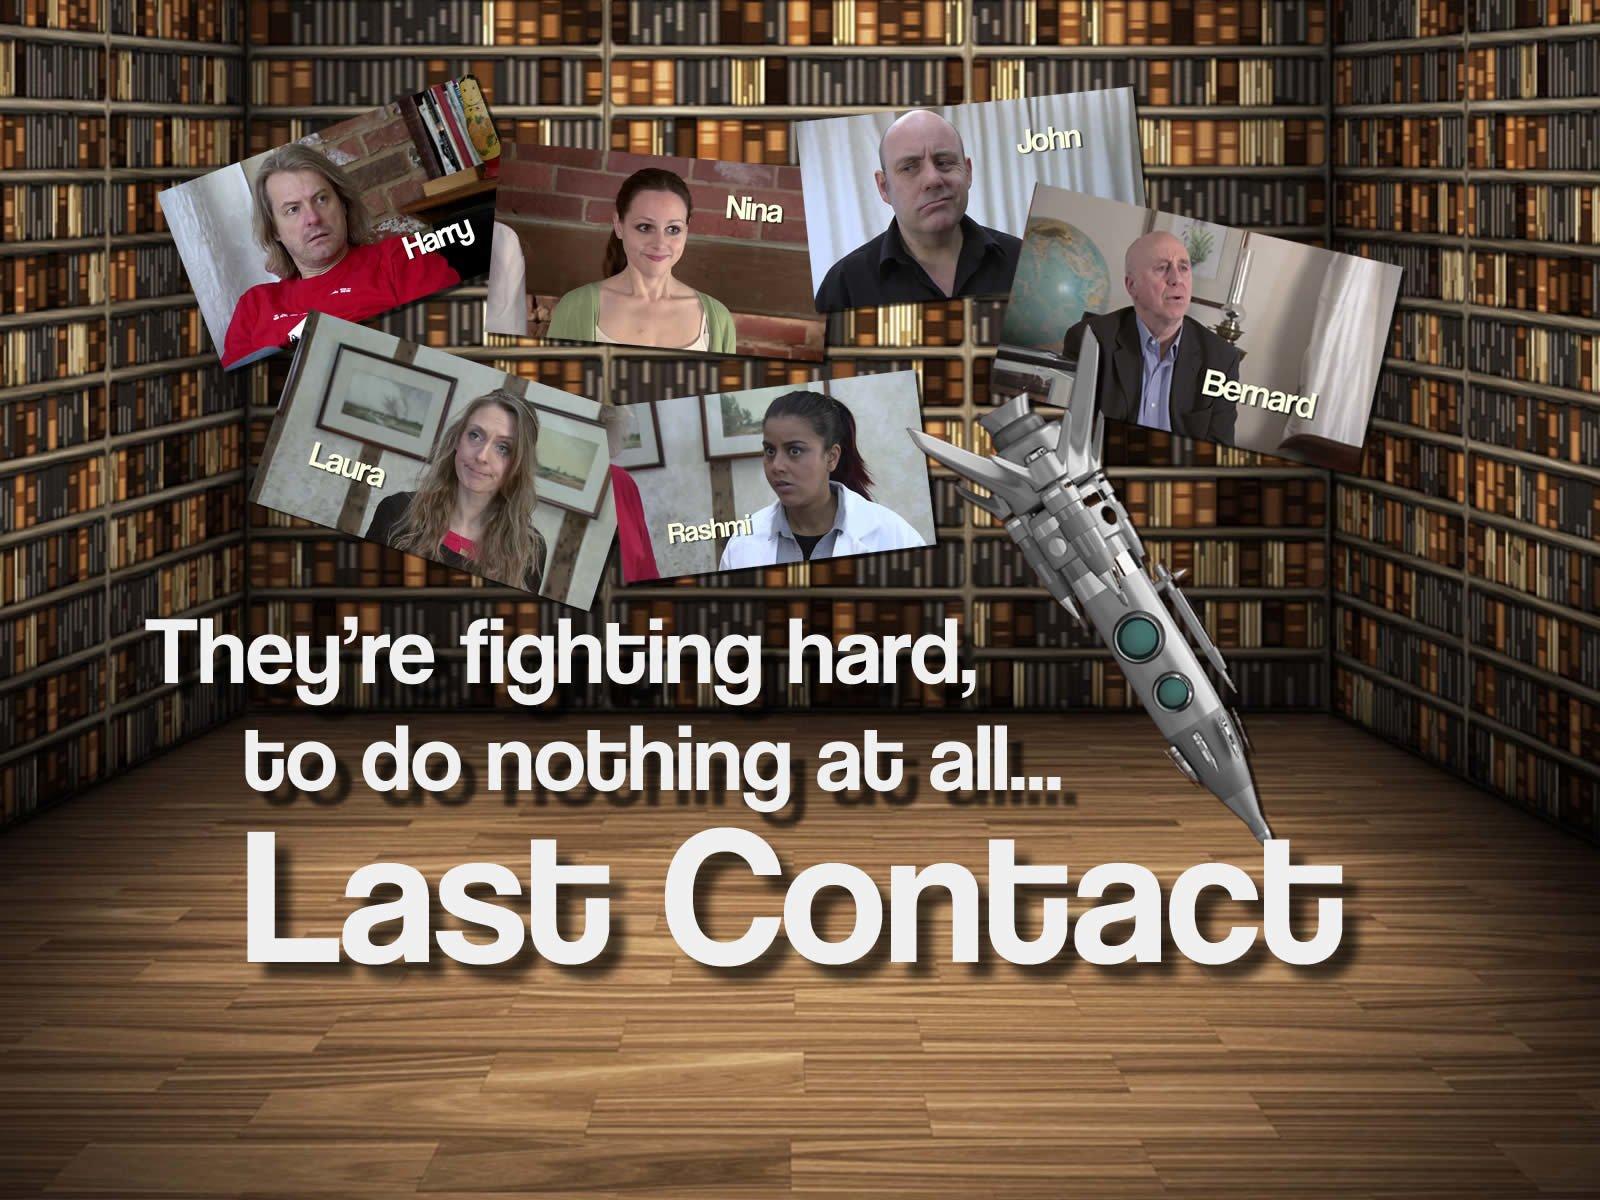 Last Contact